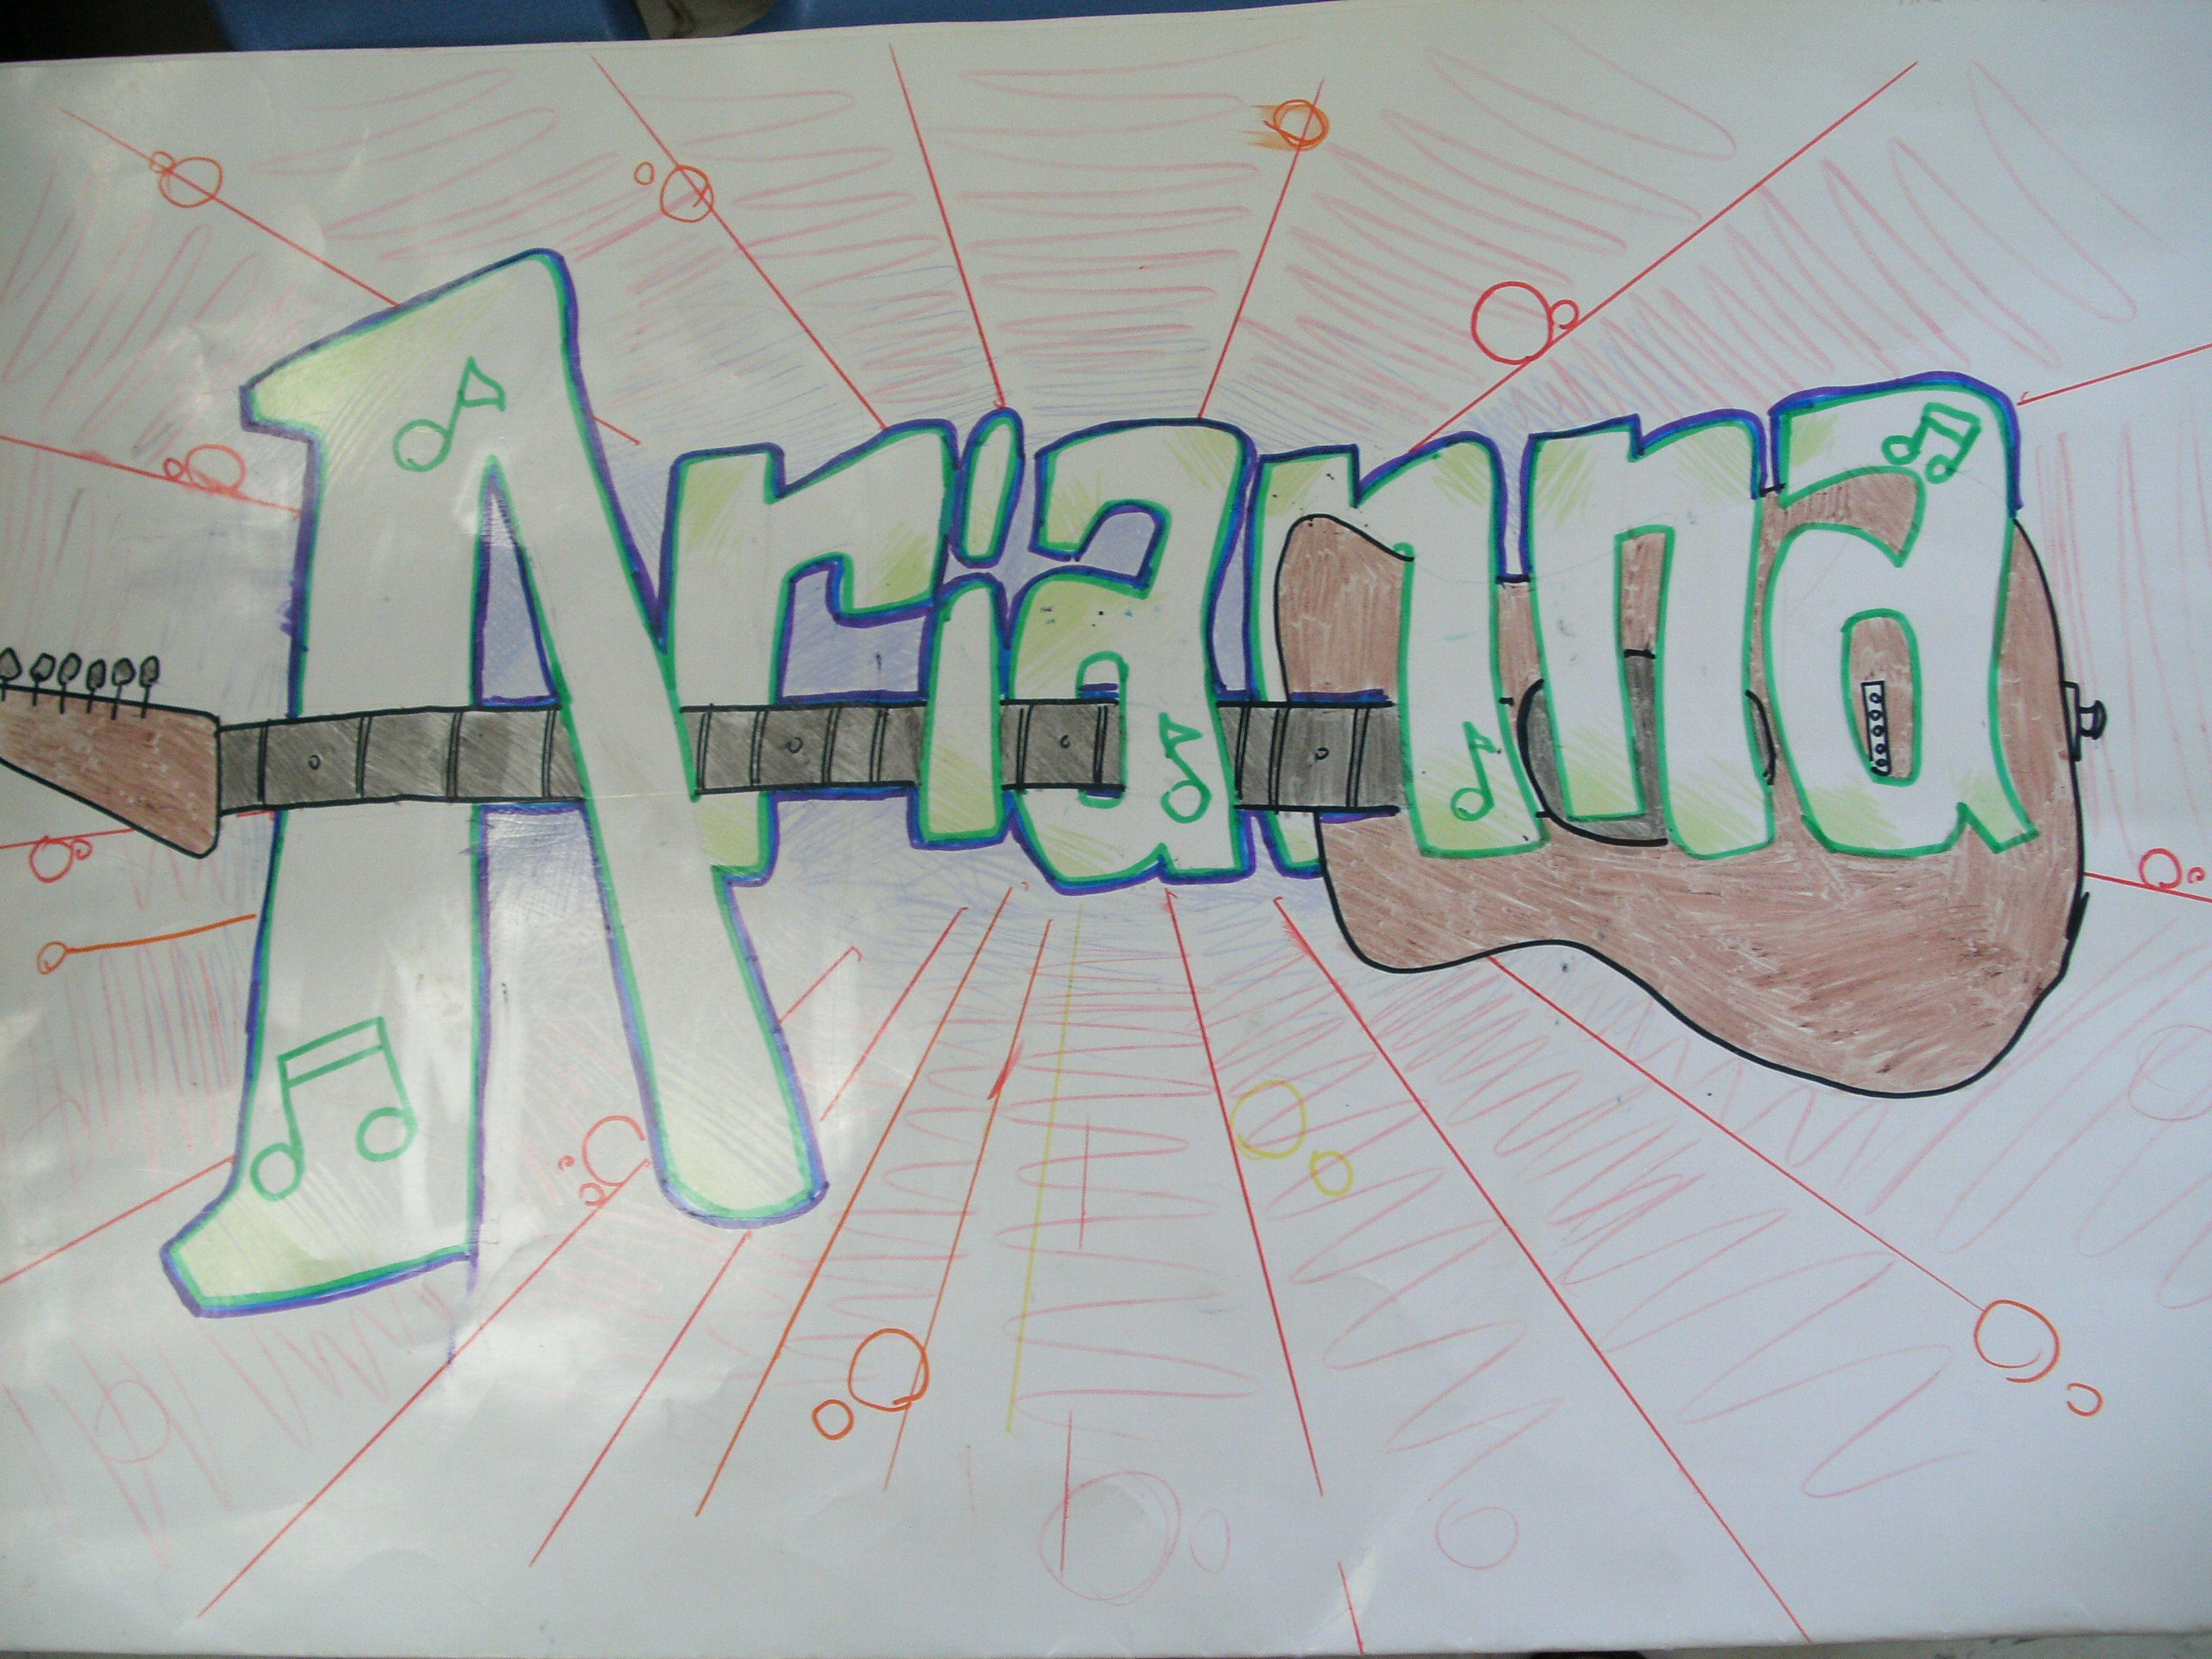 Portfolio 5th grade Skew a Name Lesson, portfolio cover ideas | Art lessons  middle school, Art school, 5th grade art